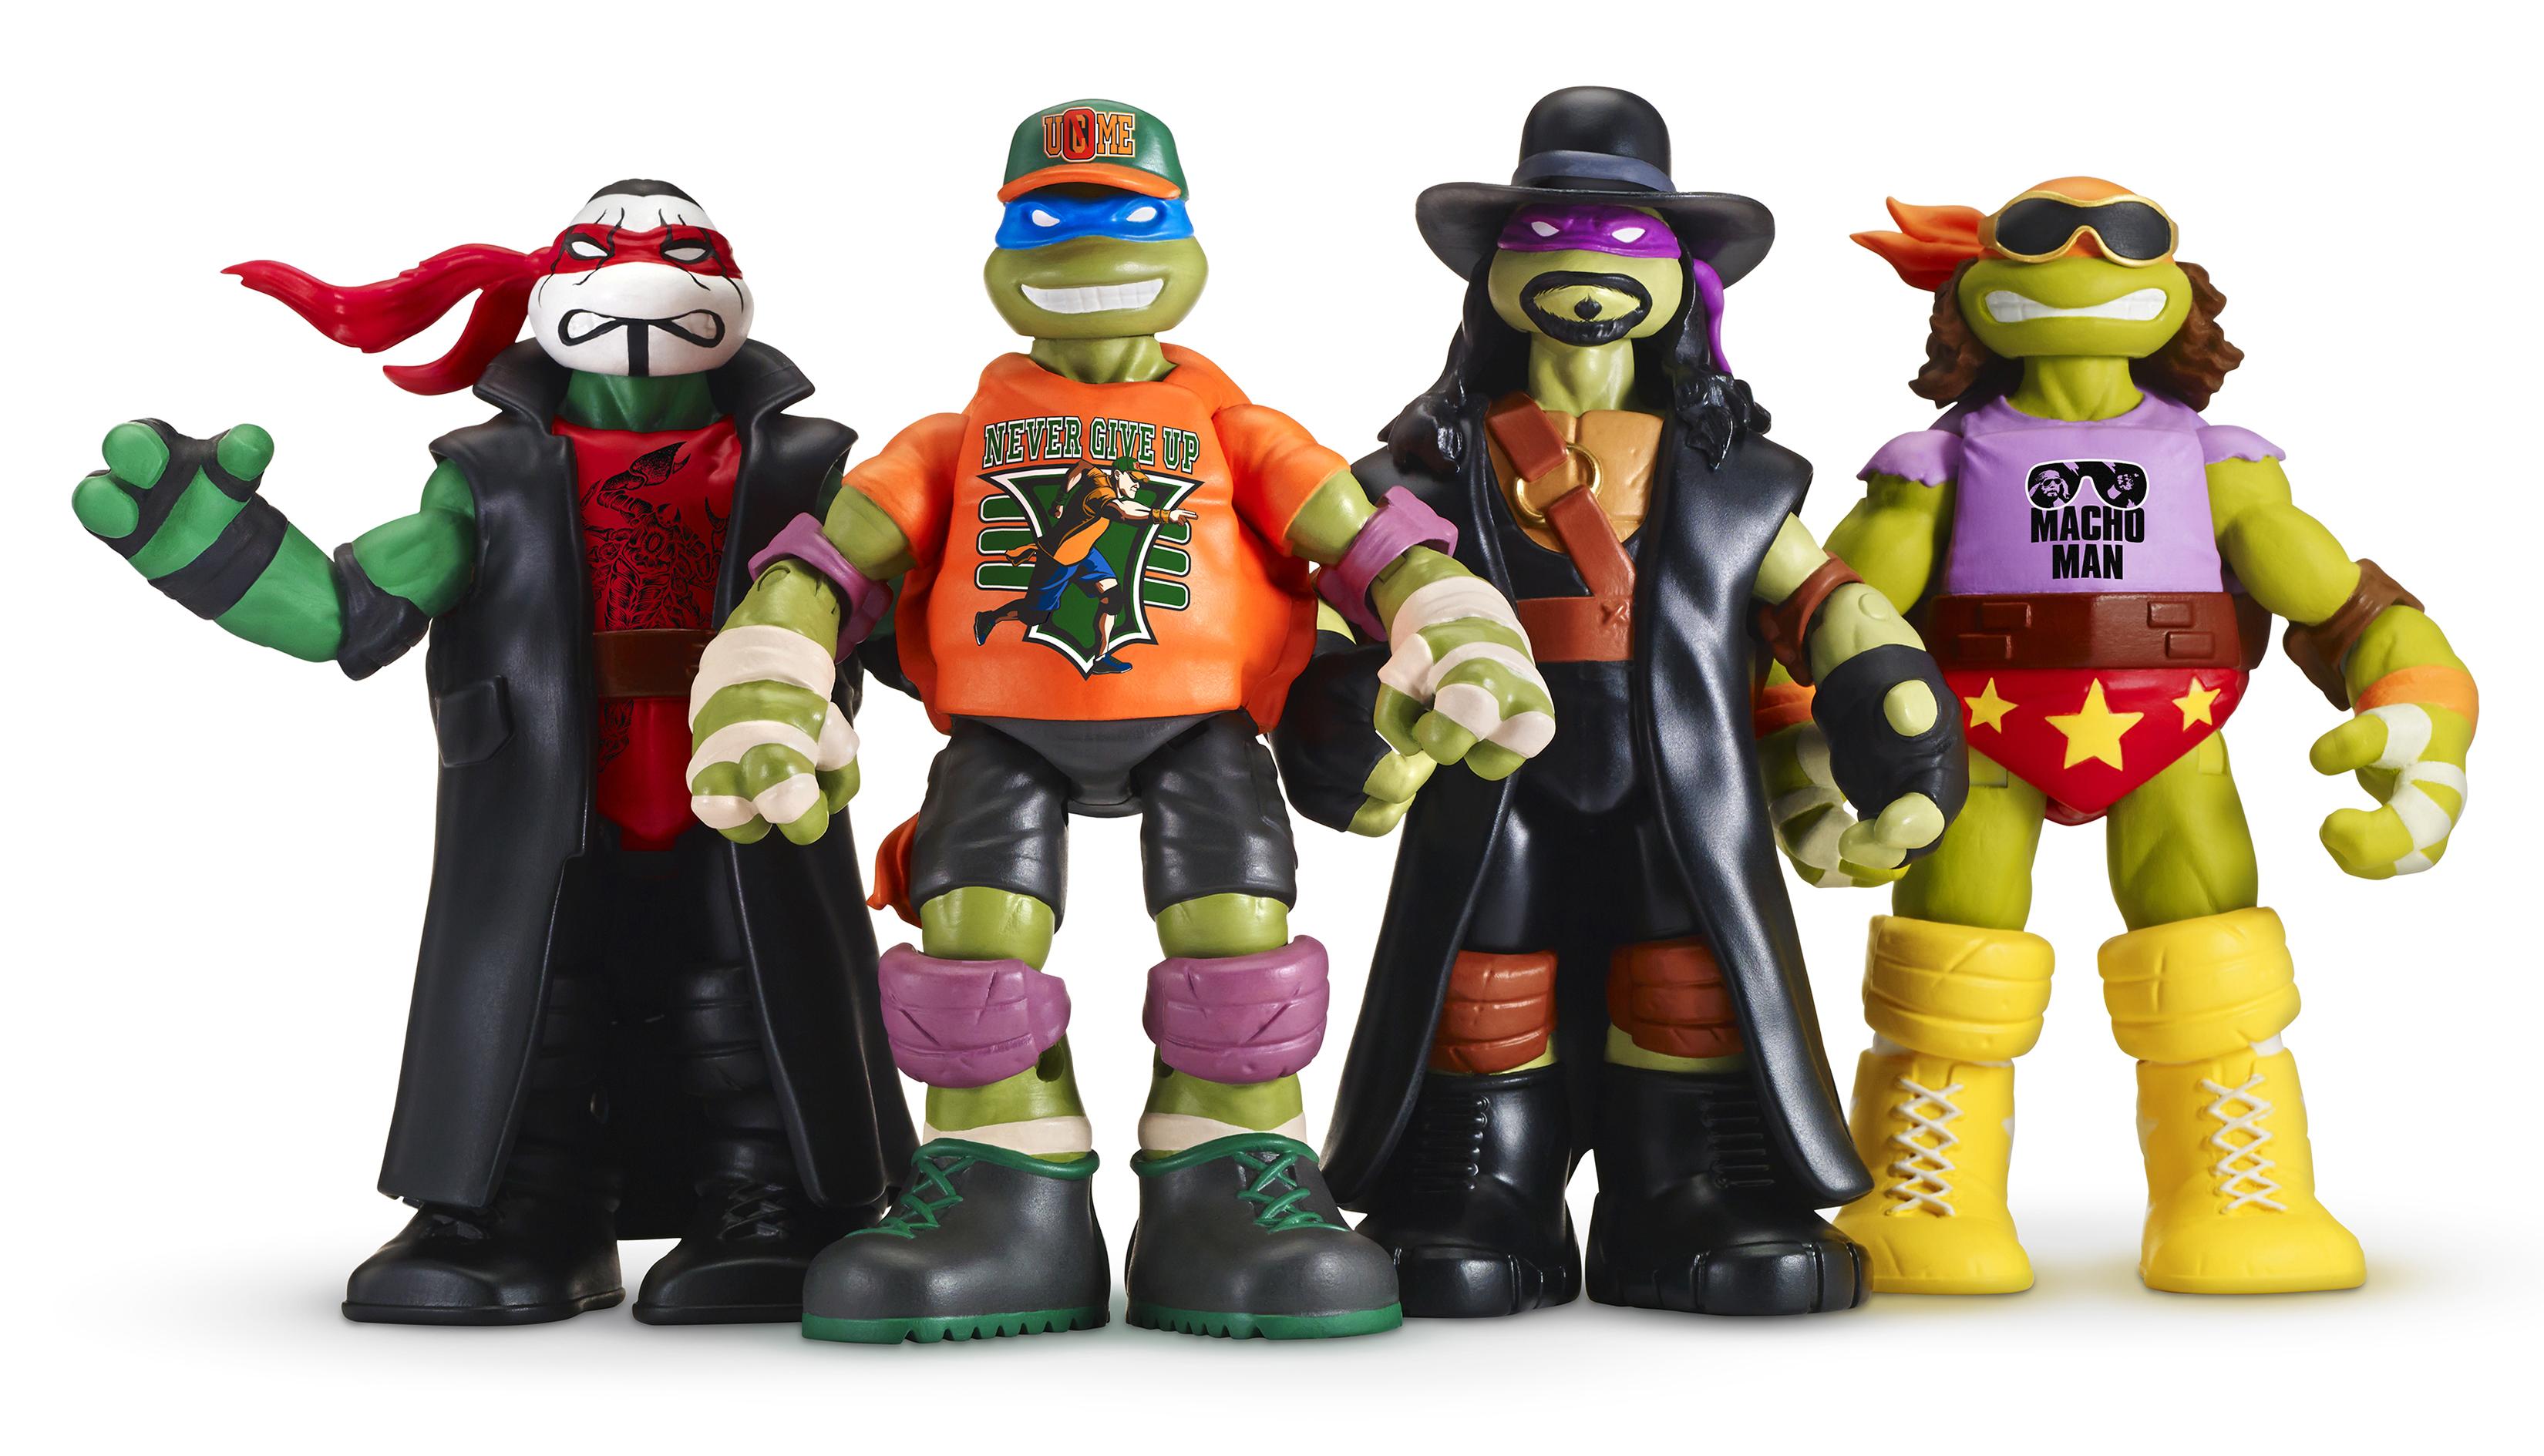 Teenage Mutant Ninja Turtles Shredder Toy : Nycc 2016: teenage mutant ninja turtles meet super shredder and